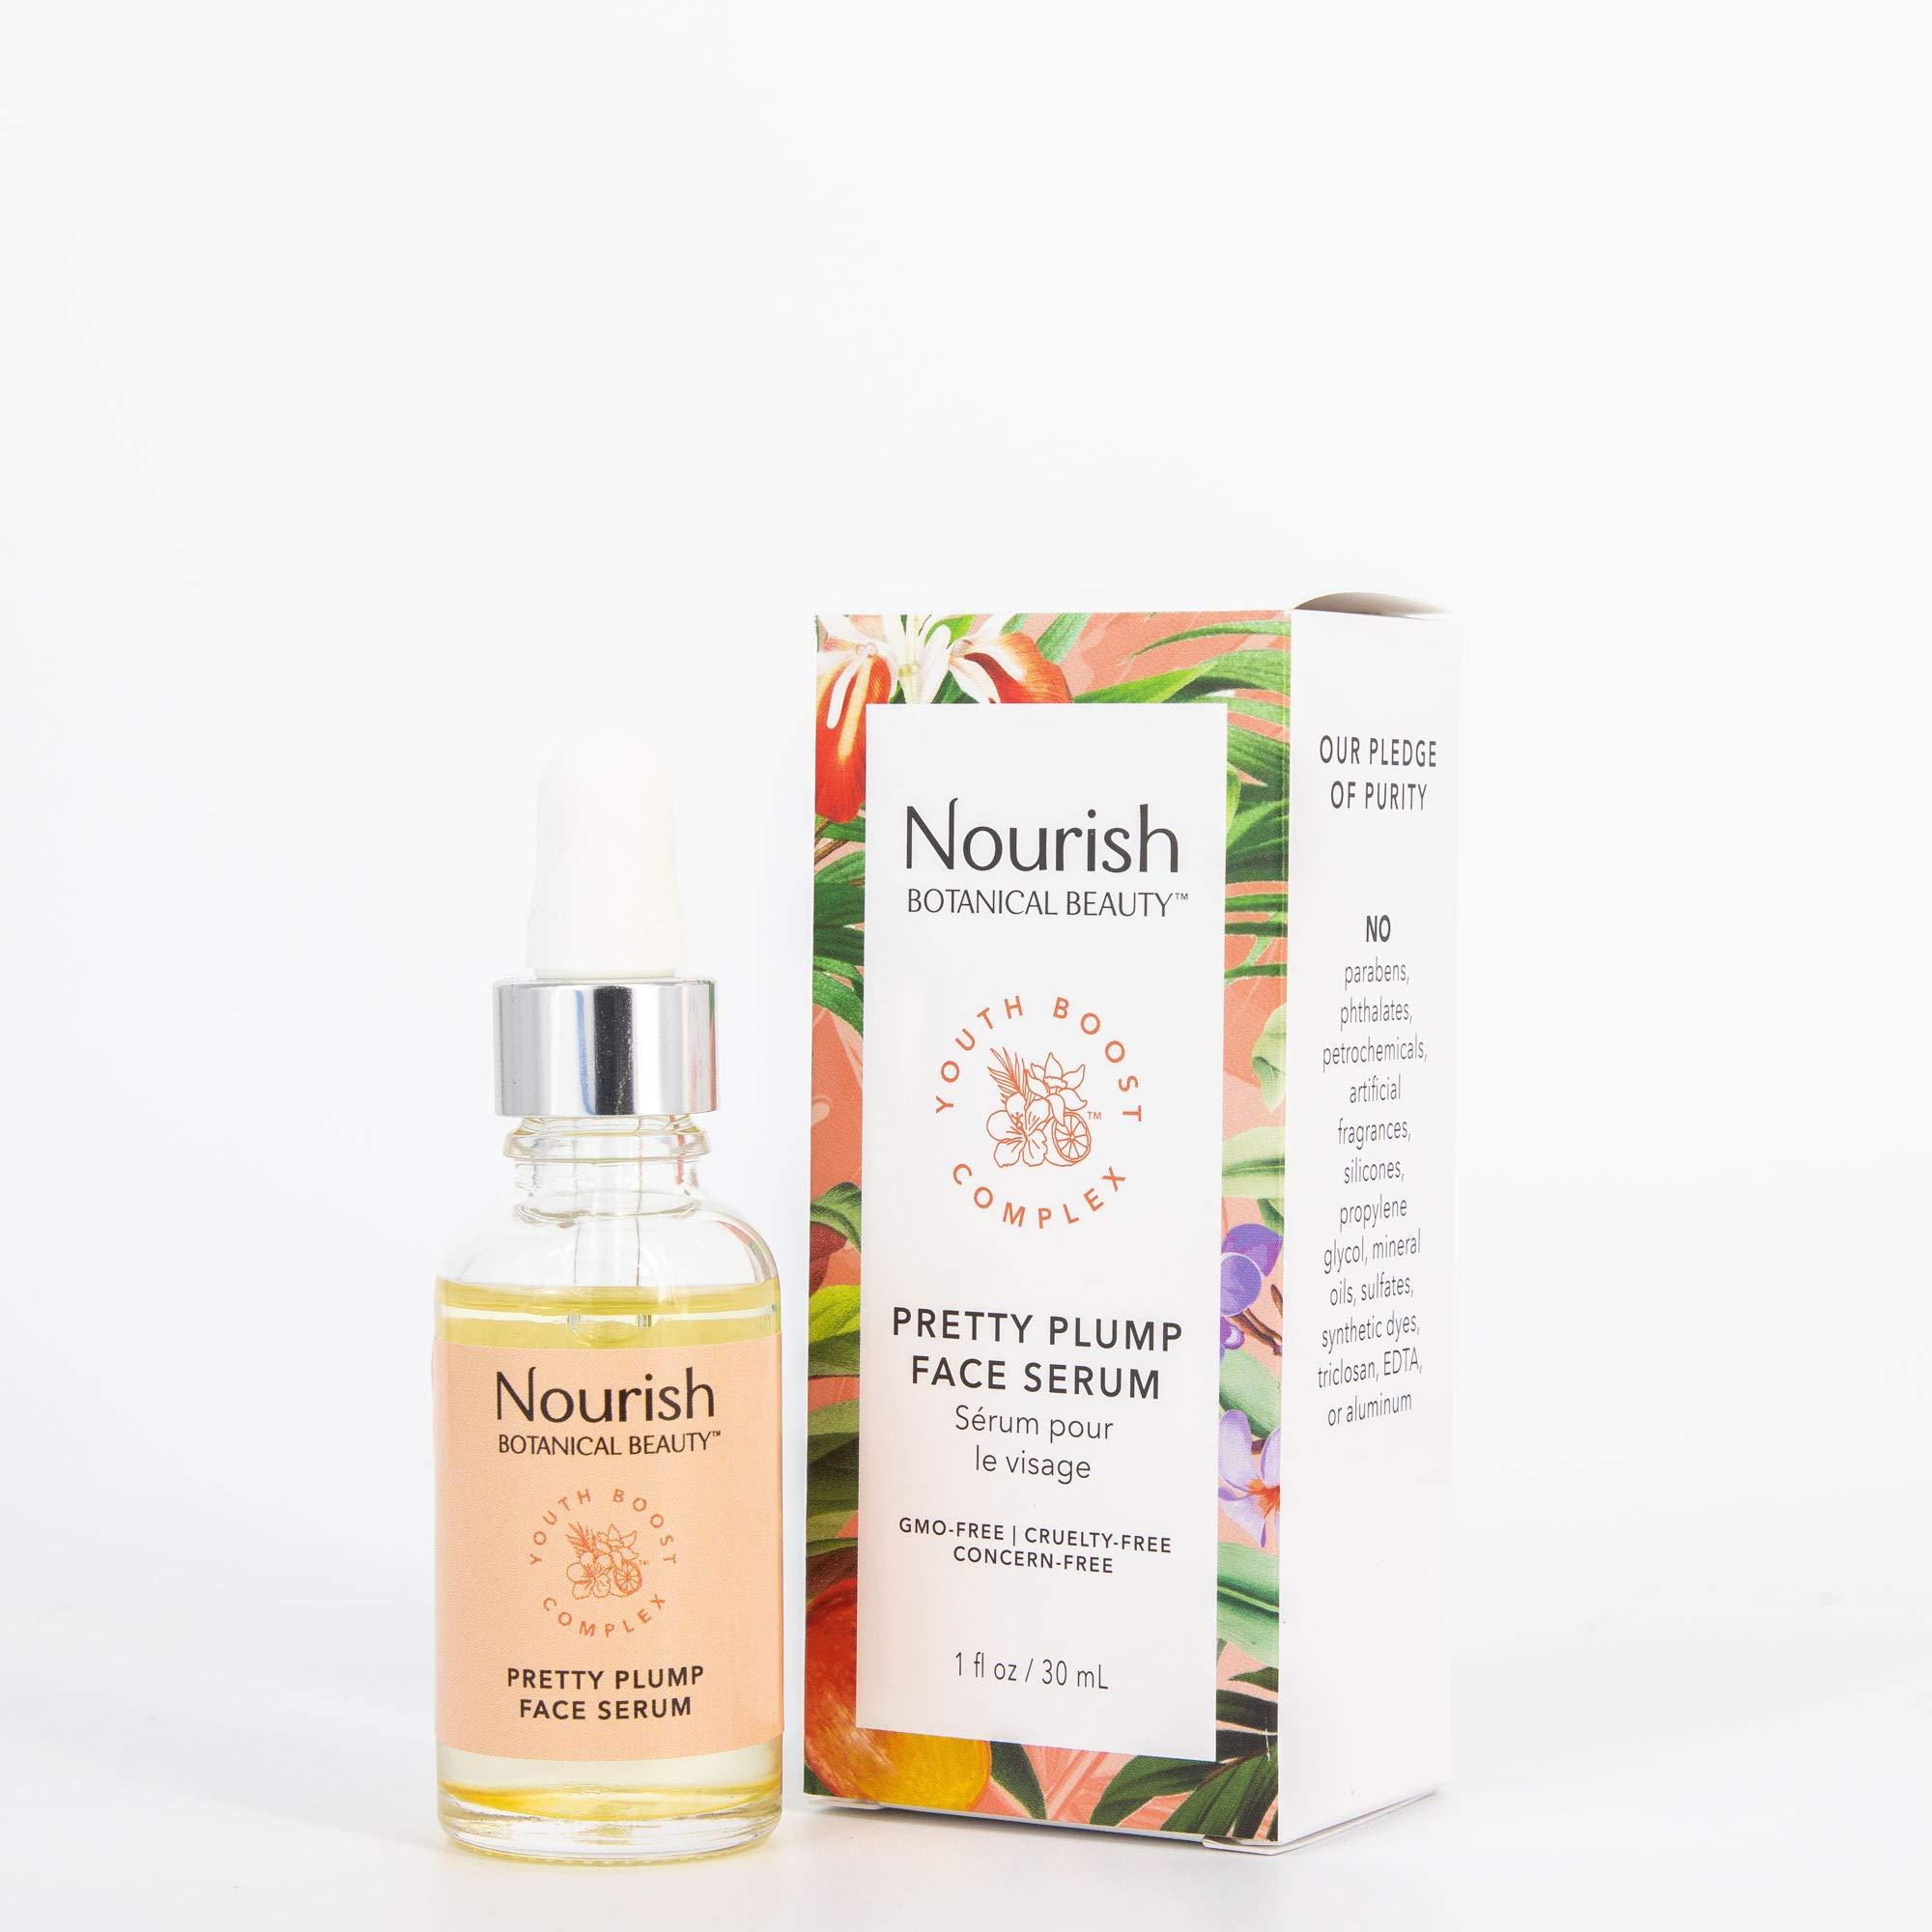 Nourish Botanical Beauty Pretty Plump Face Serum, 1